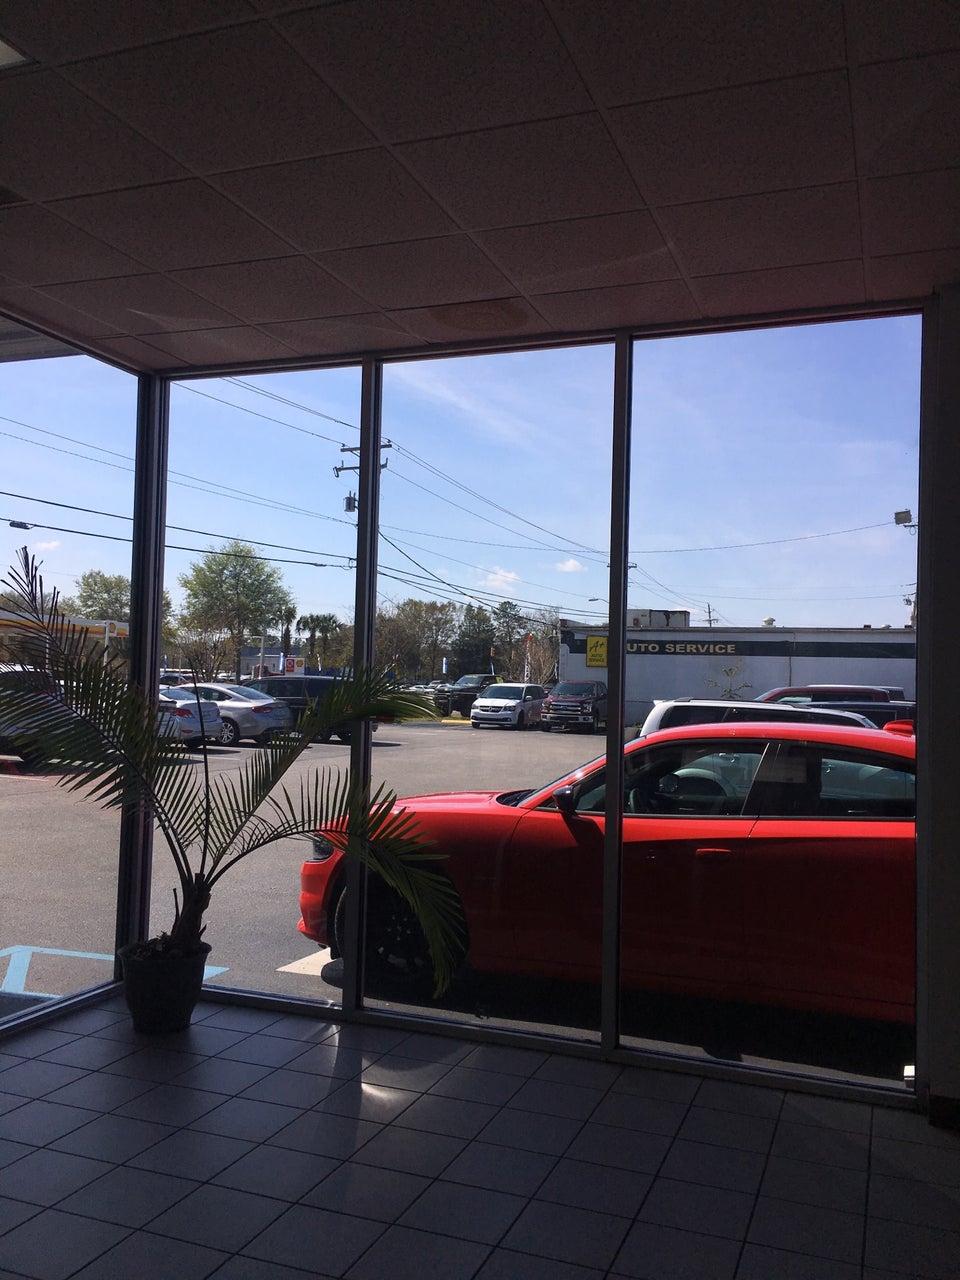 Thrifty Car Rental 3826 W Montague Ave, Charleston